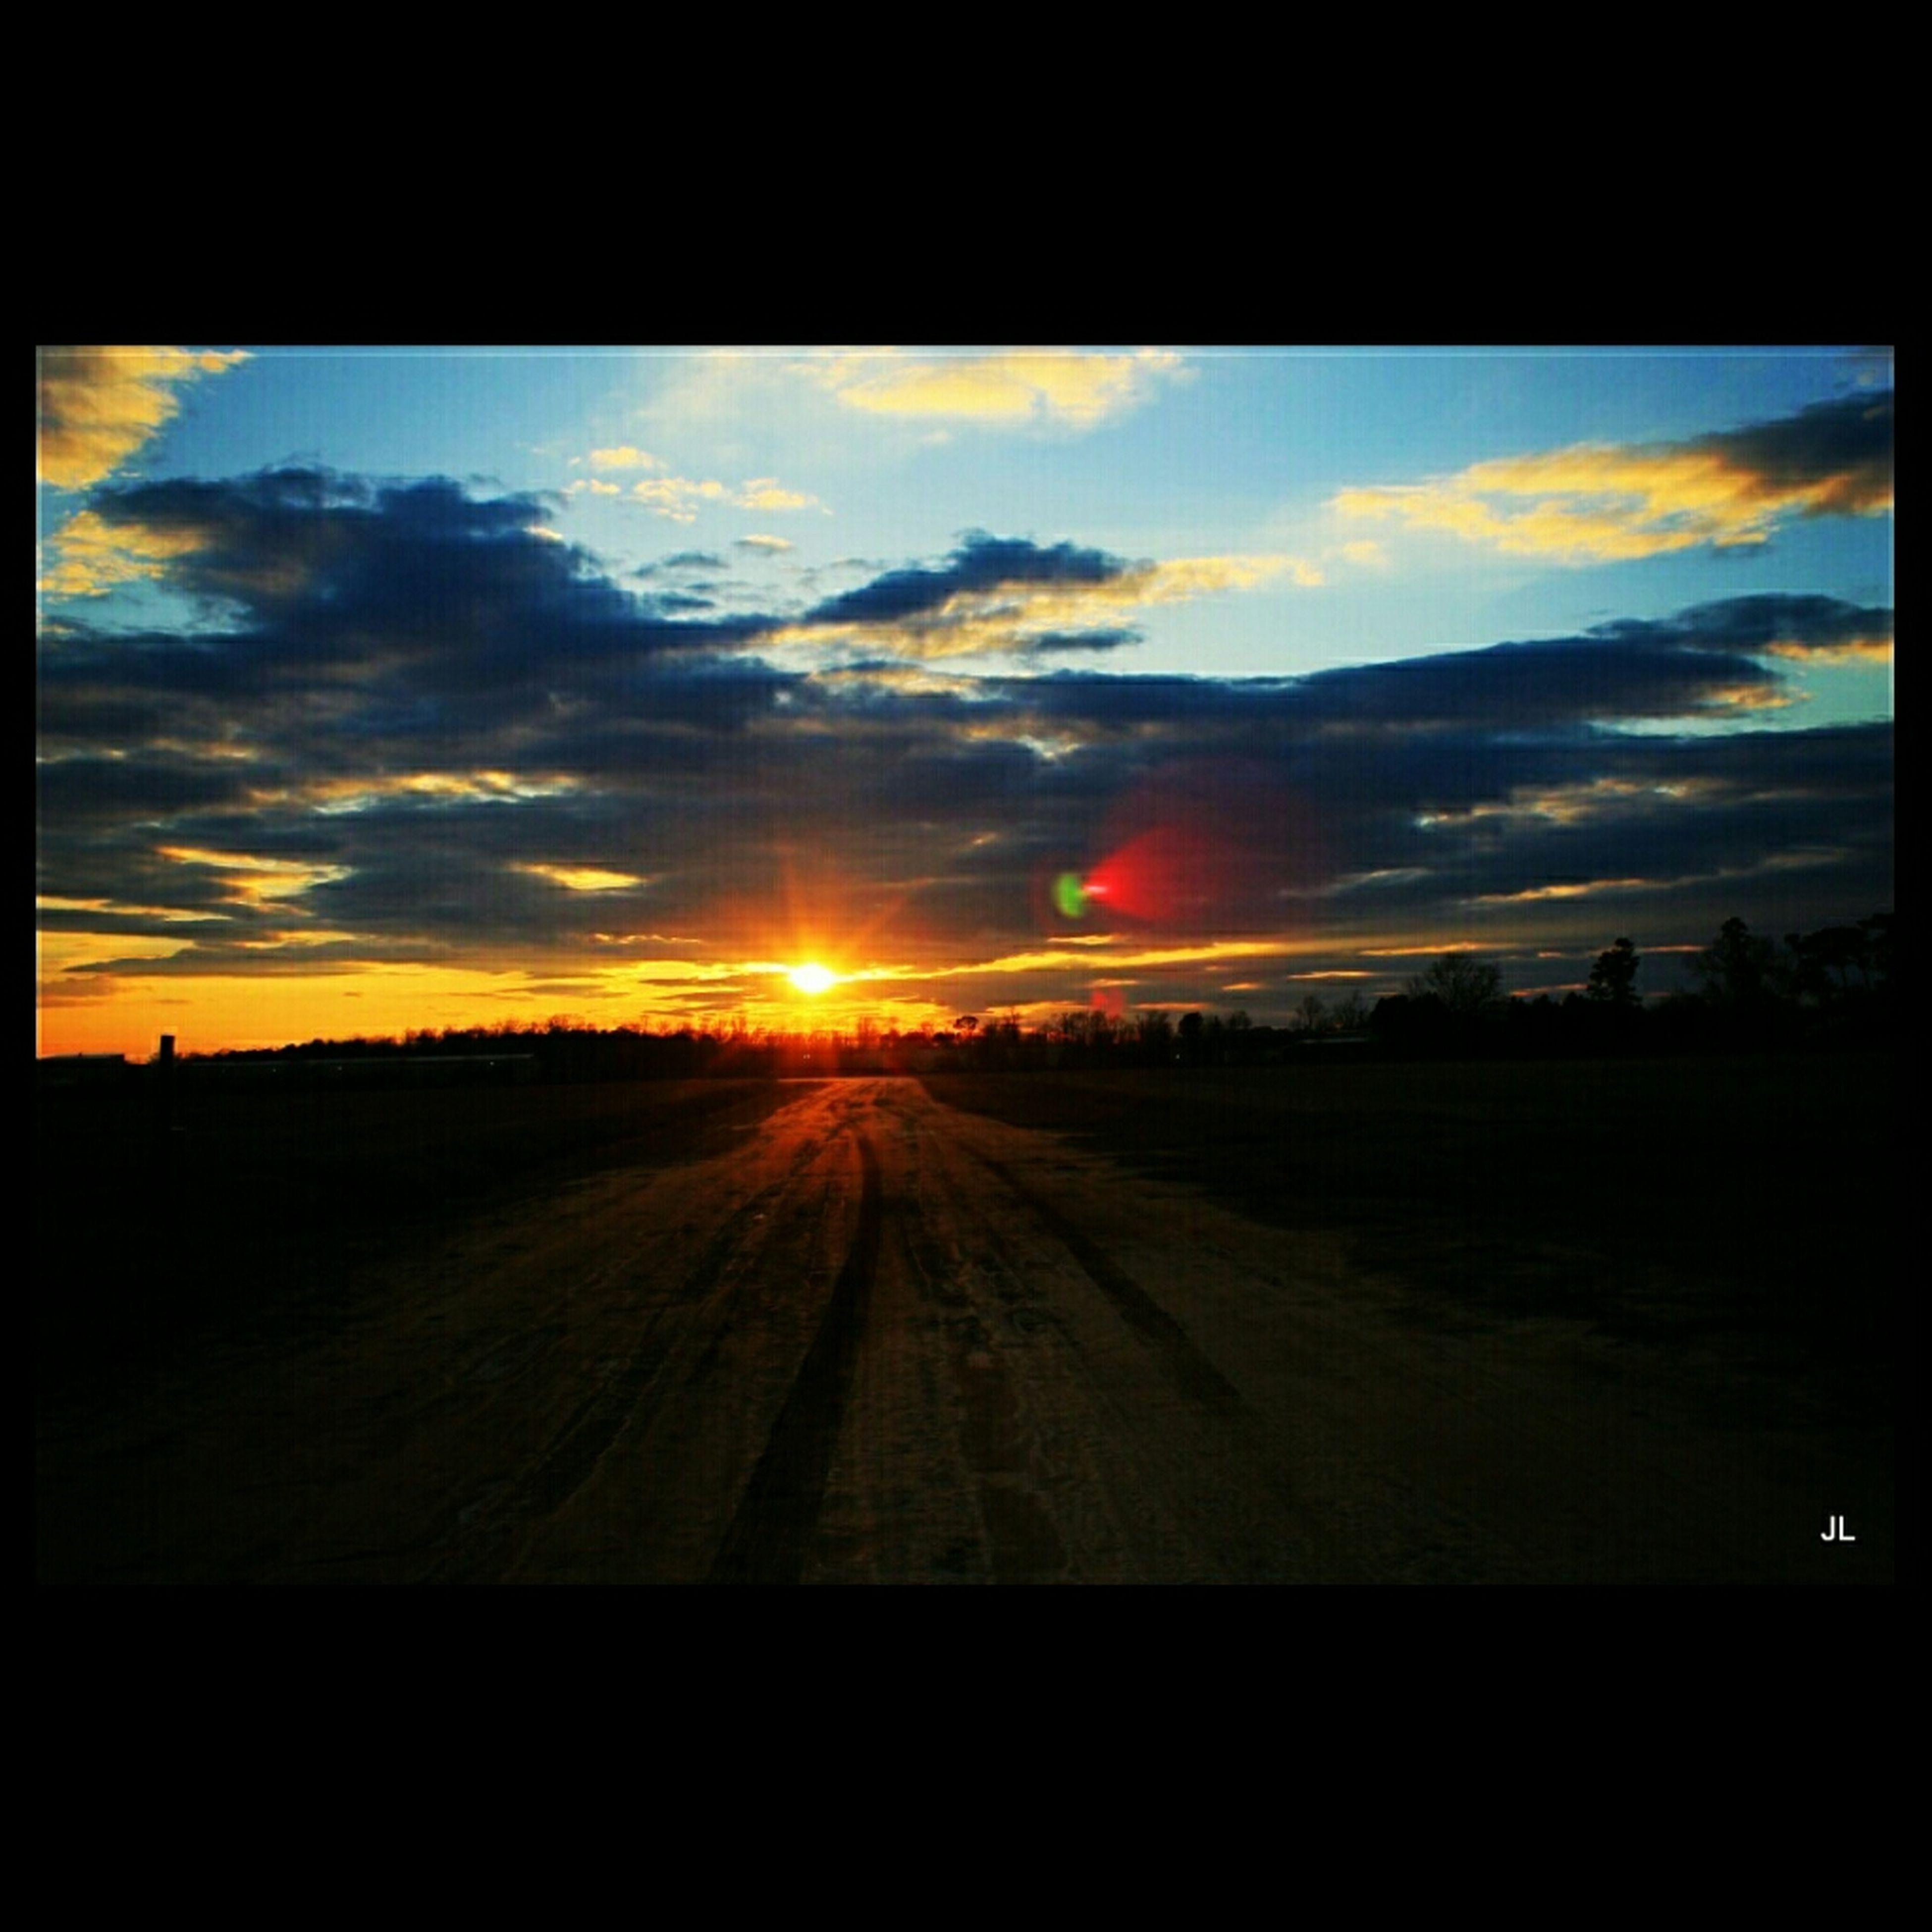 sunset, sky, cloud - sky, transportation, transfer print, sun, landscape, orange color, scenics, cloud, tranquil scene, silhouette, cloudy, beauty in nature, auto post production filter, dramatic sky, tranquility, road, nature, sunlight